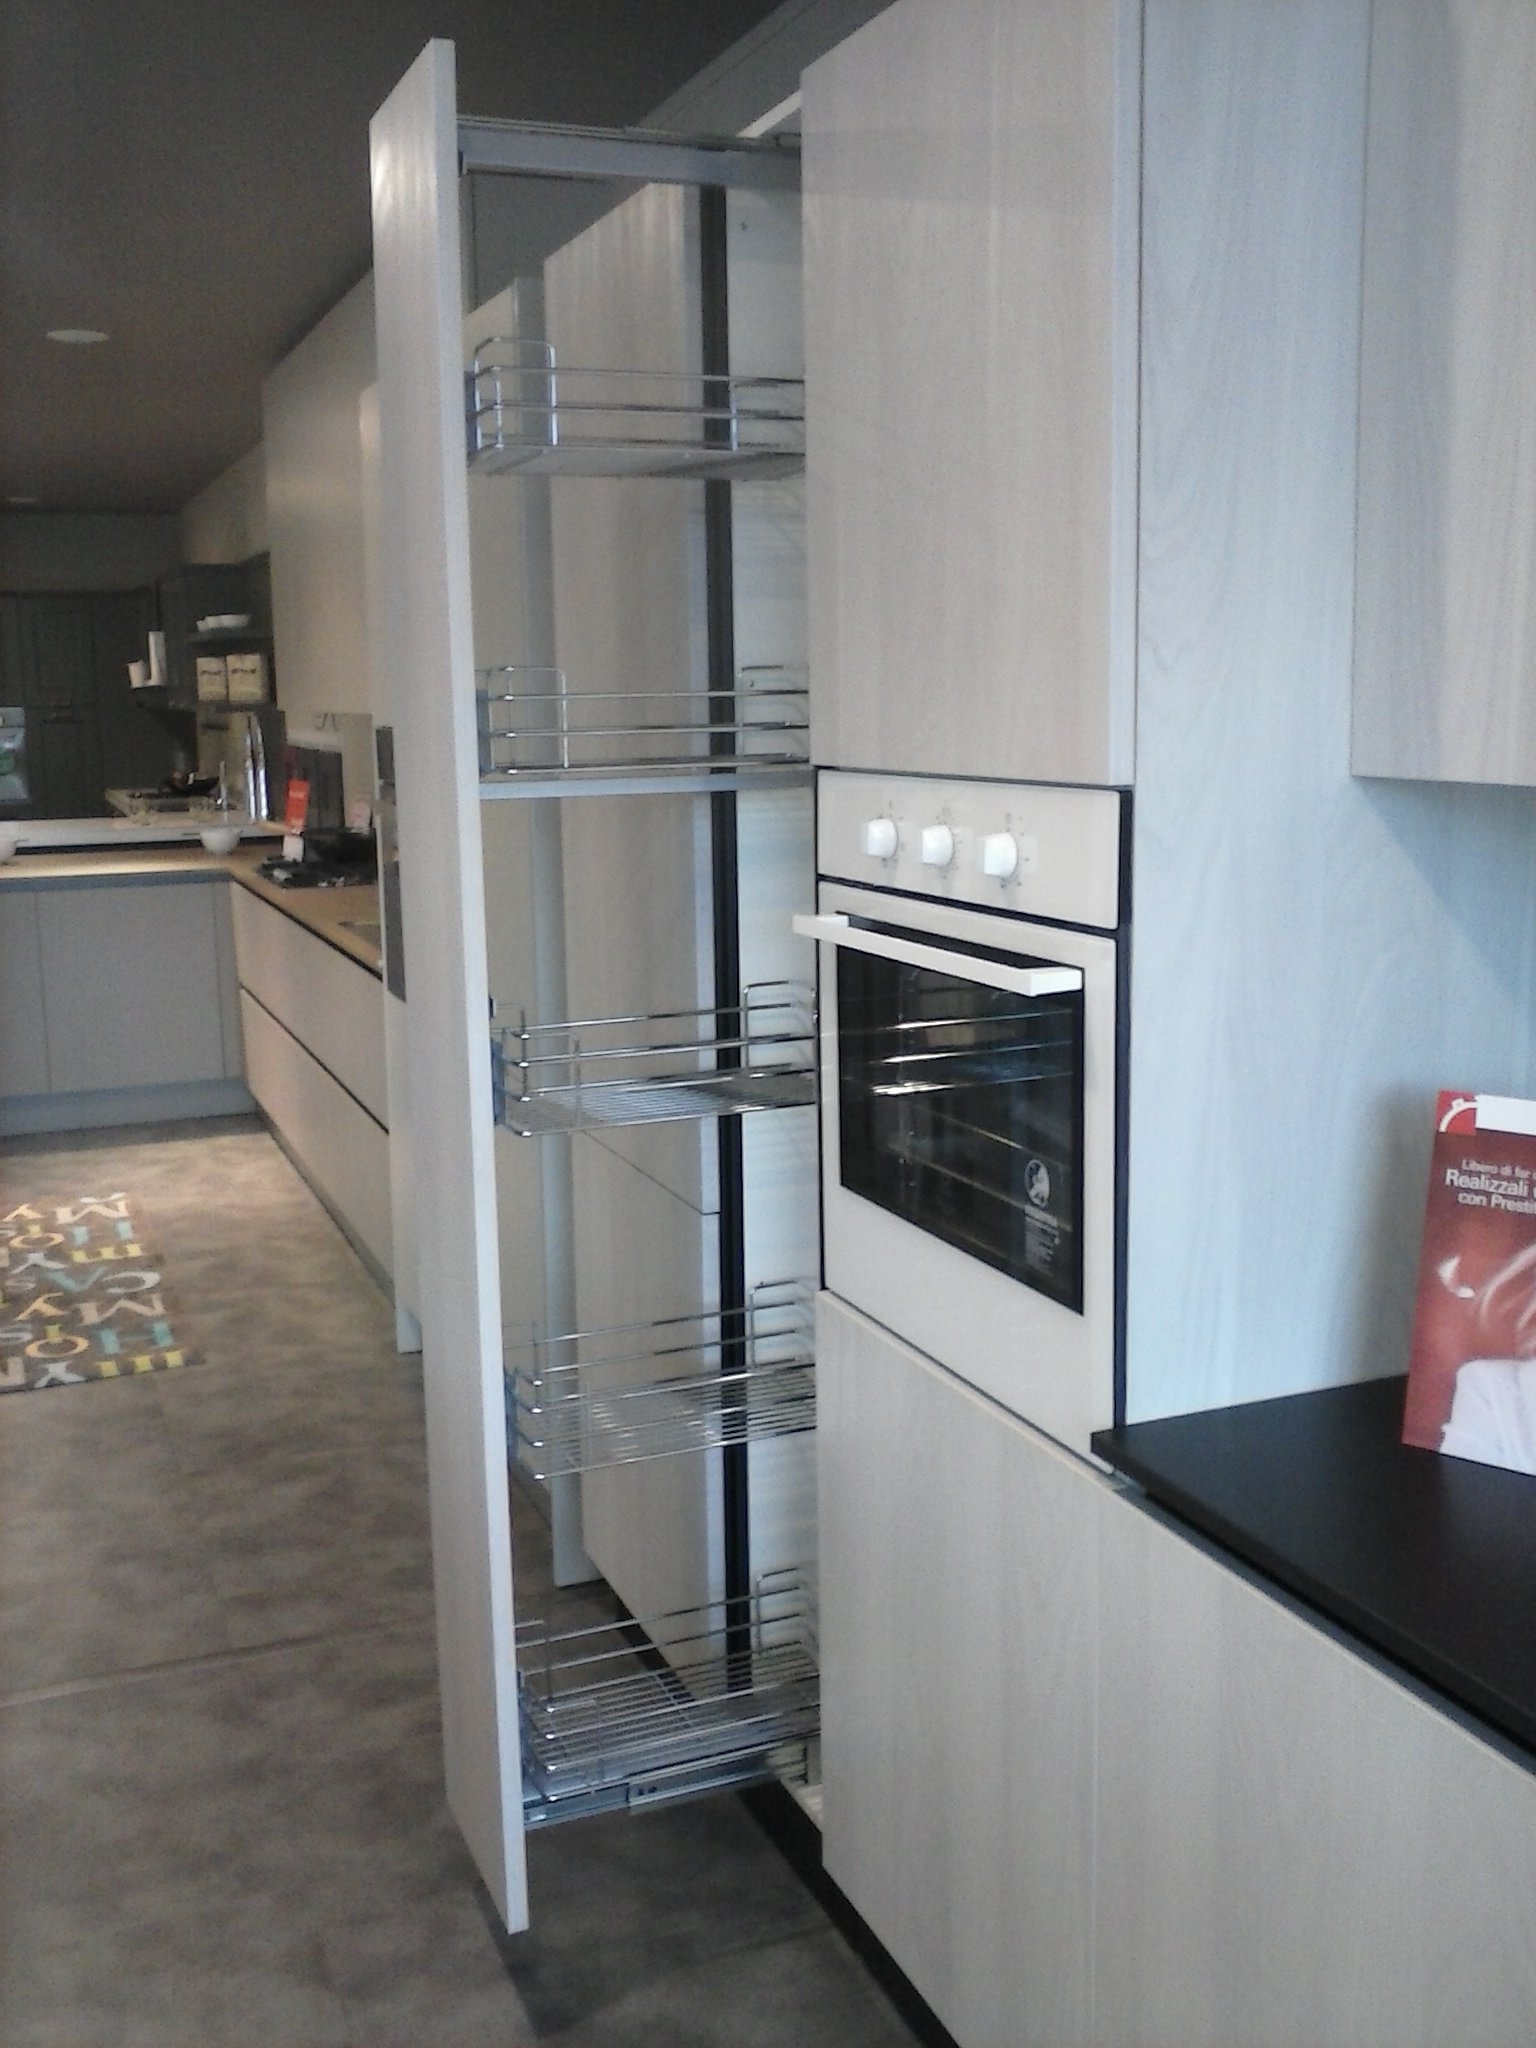 Stunning Ged Cucine Opinioni Gallery - Home Design Ideas 2017 ...